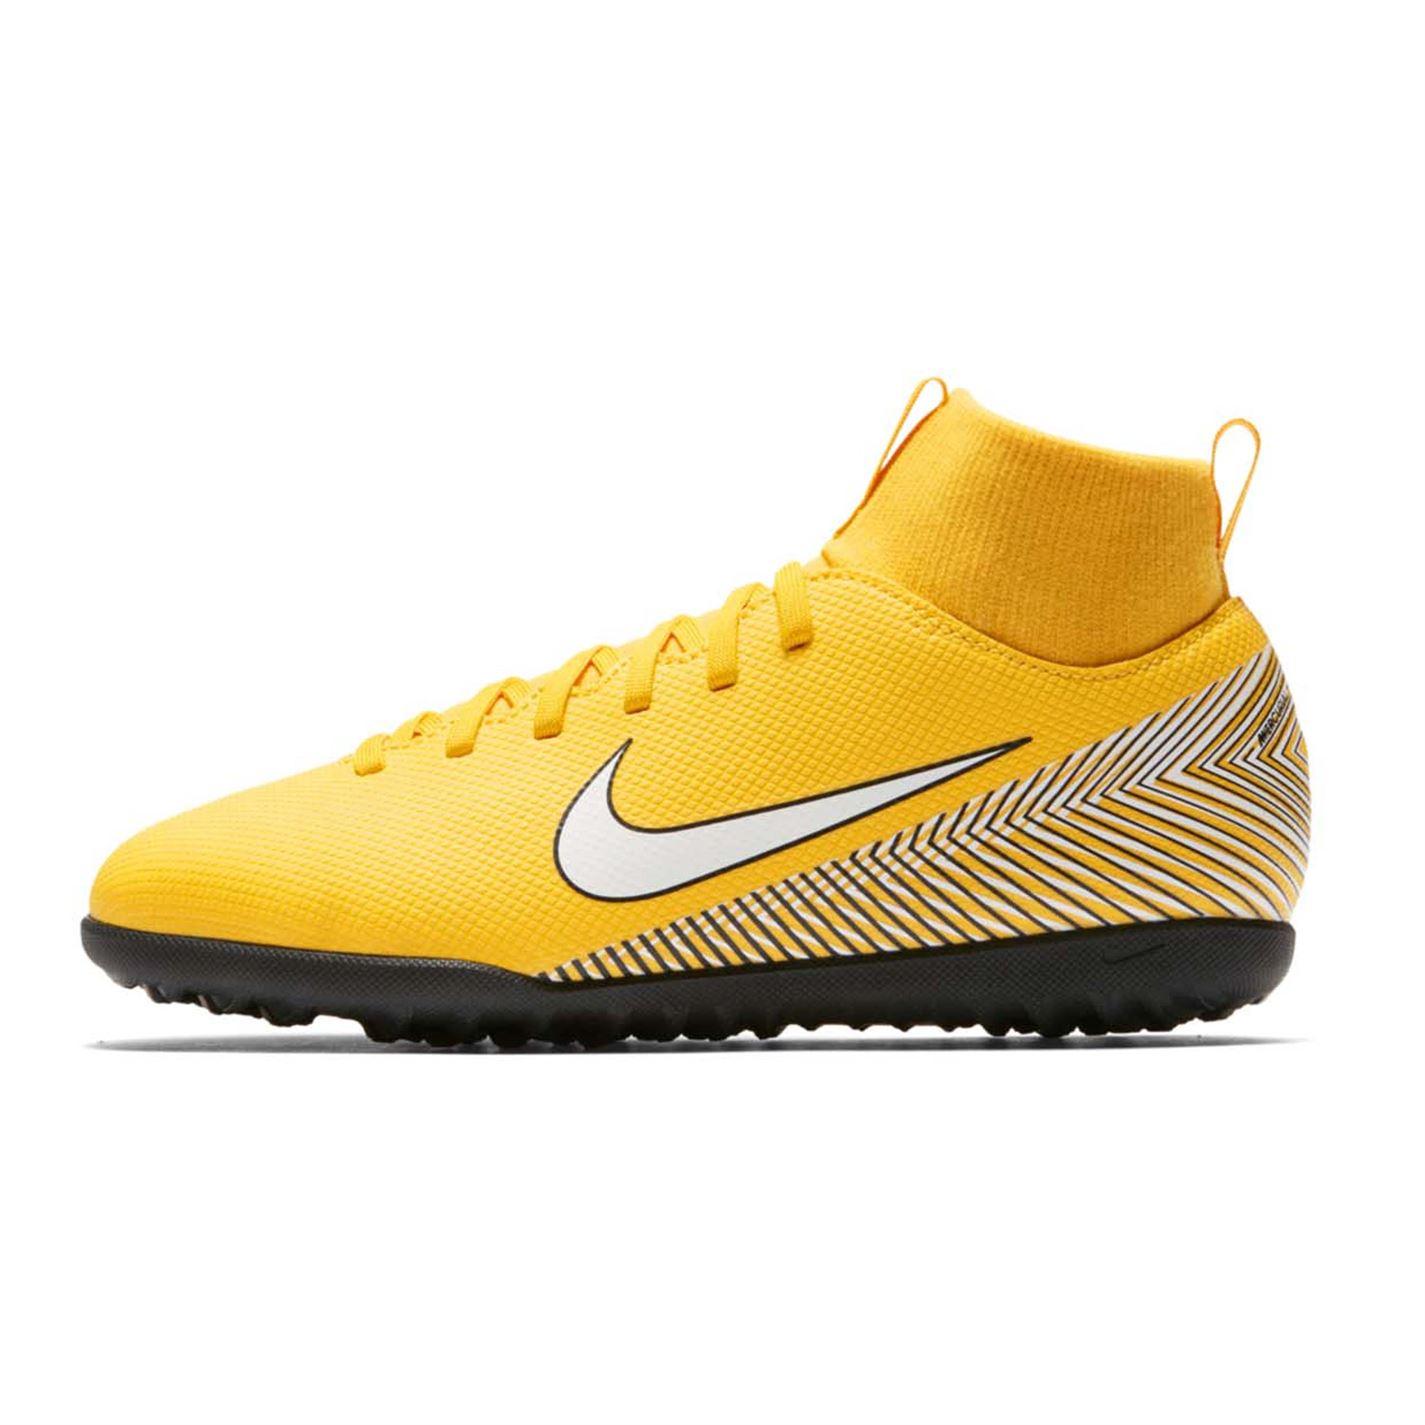 NIKE Nike Mercurial Superfly Club